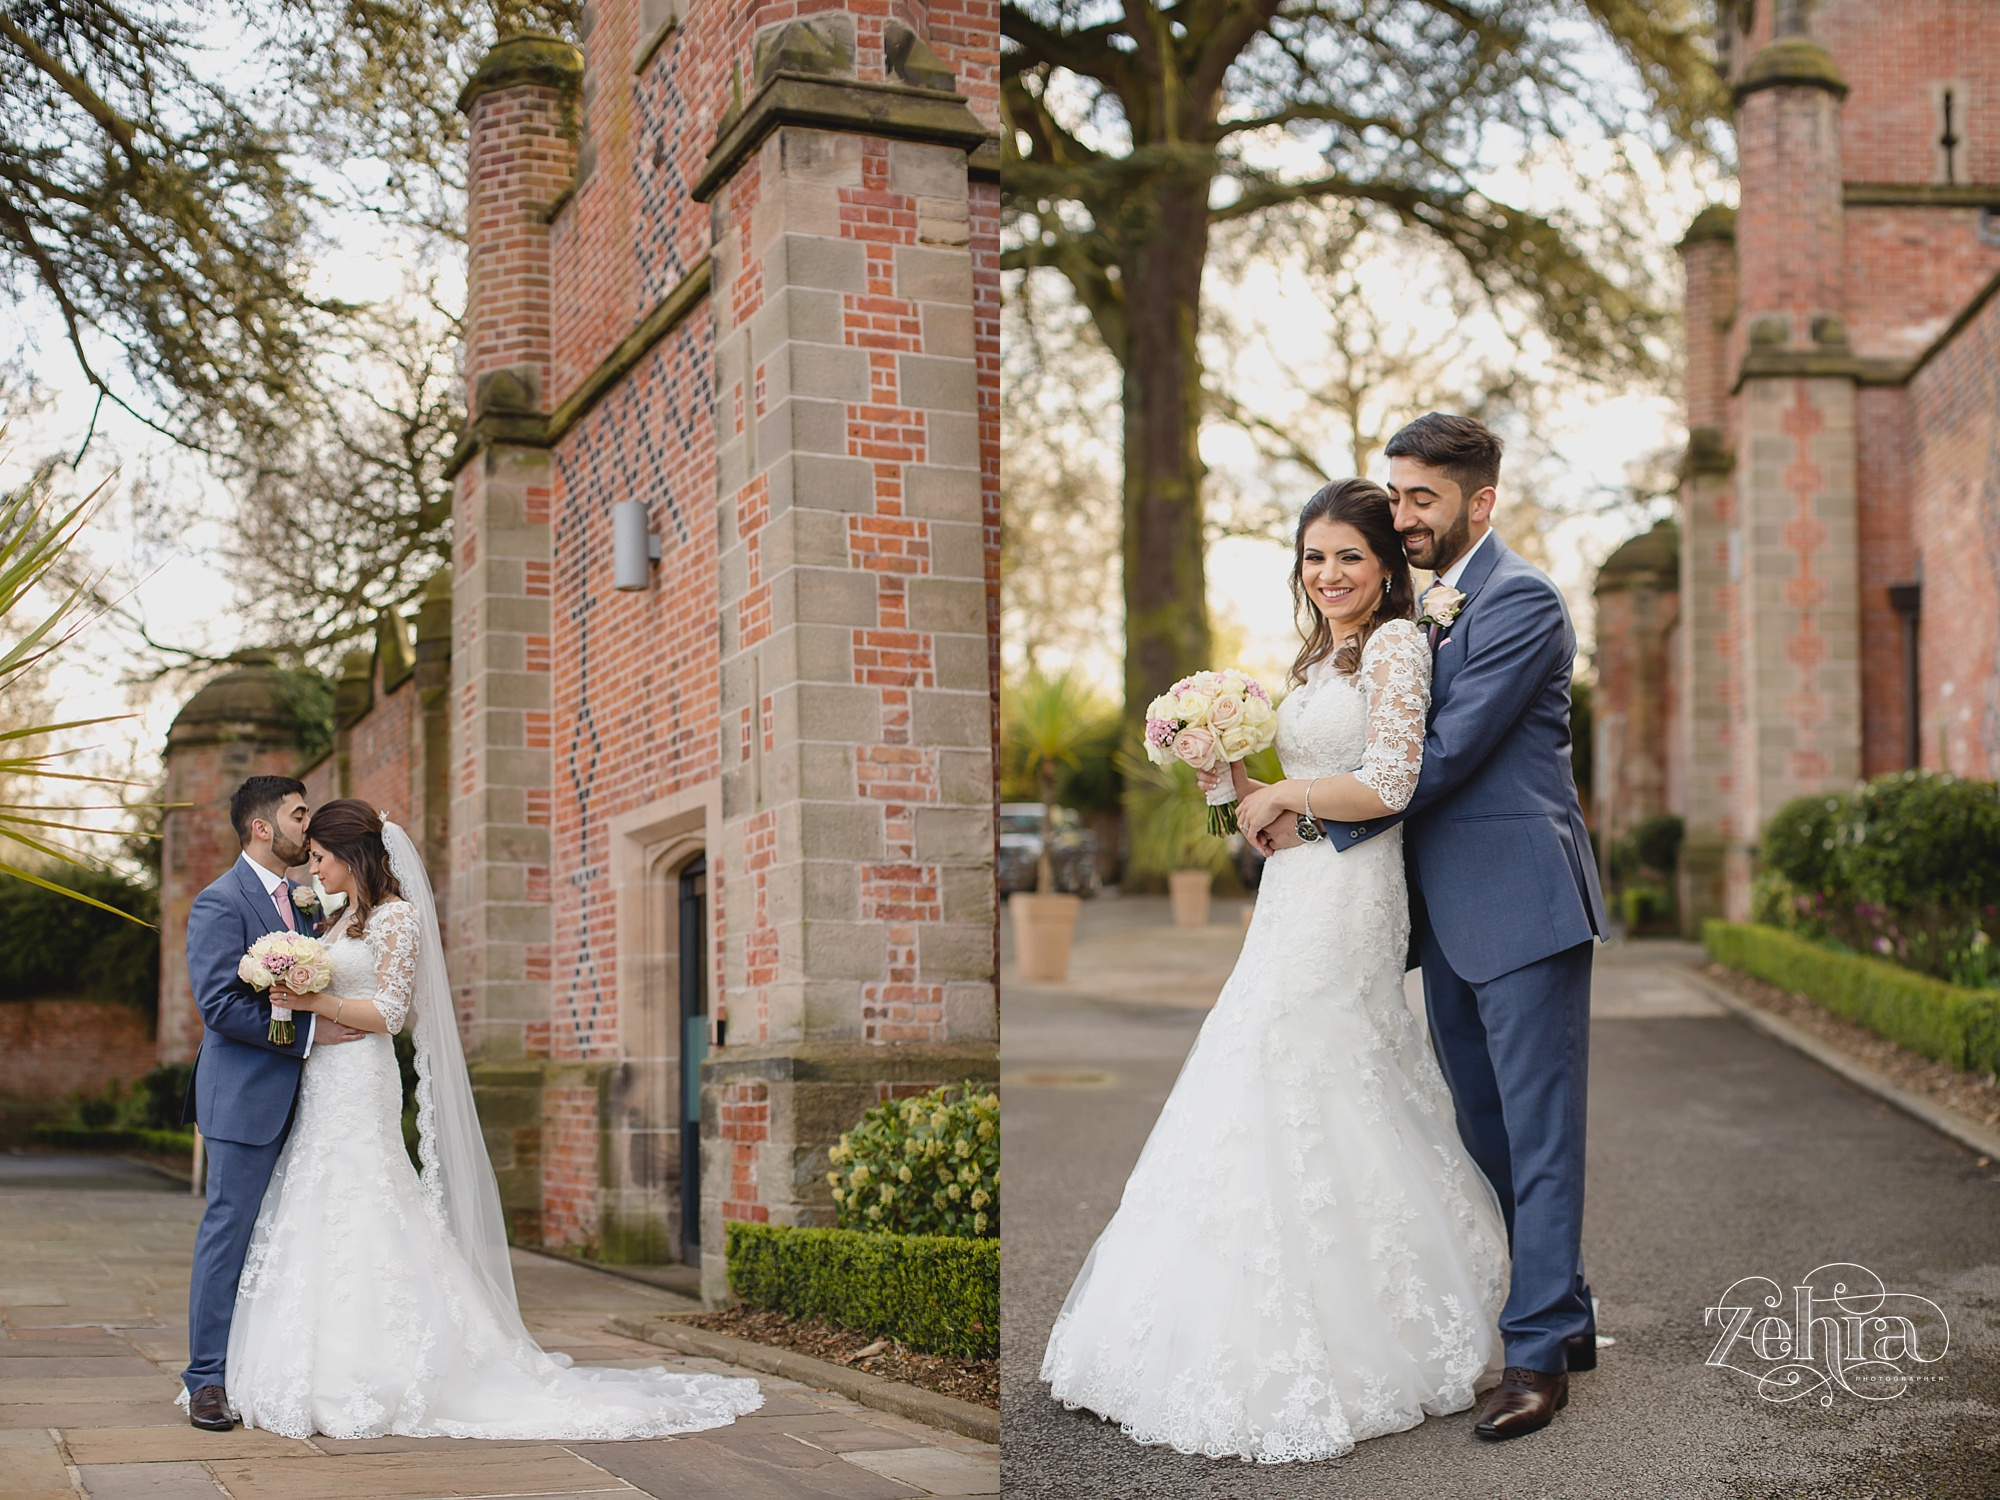 zehra photographer mere cheshire wedding_0018.jpg